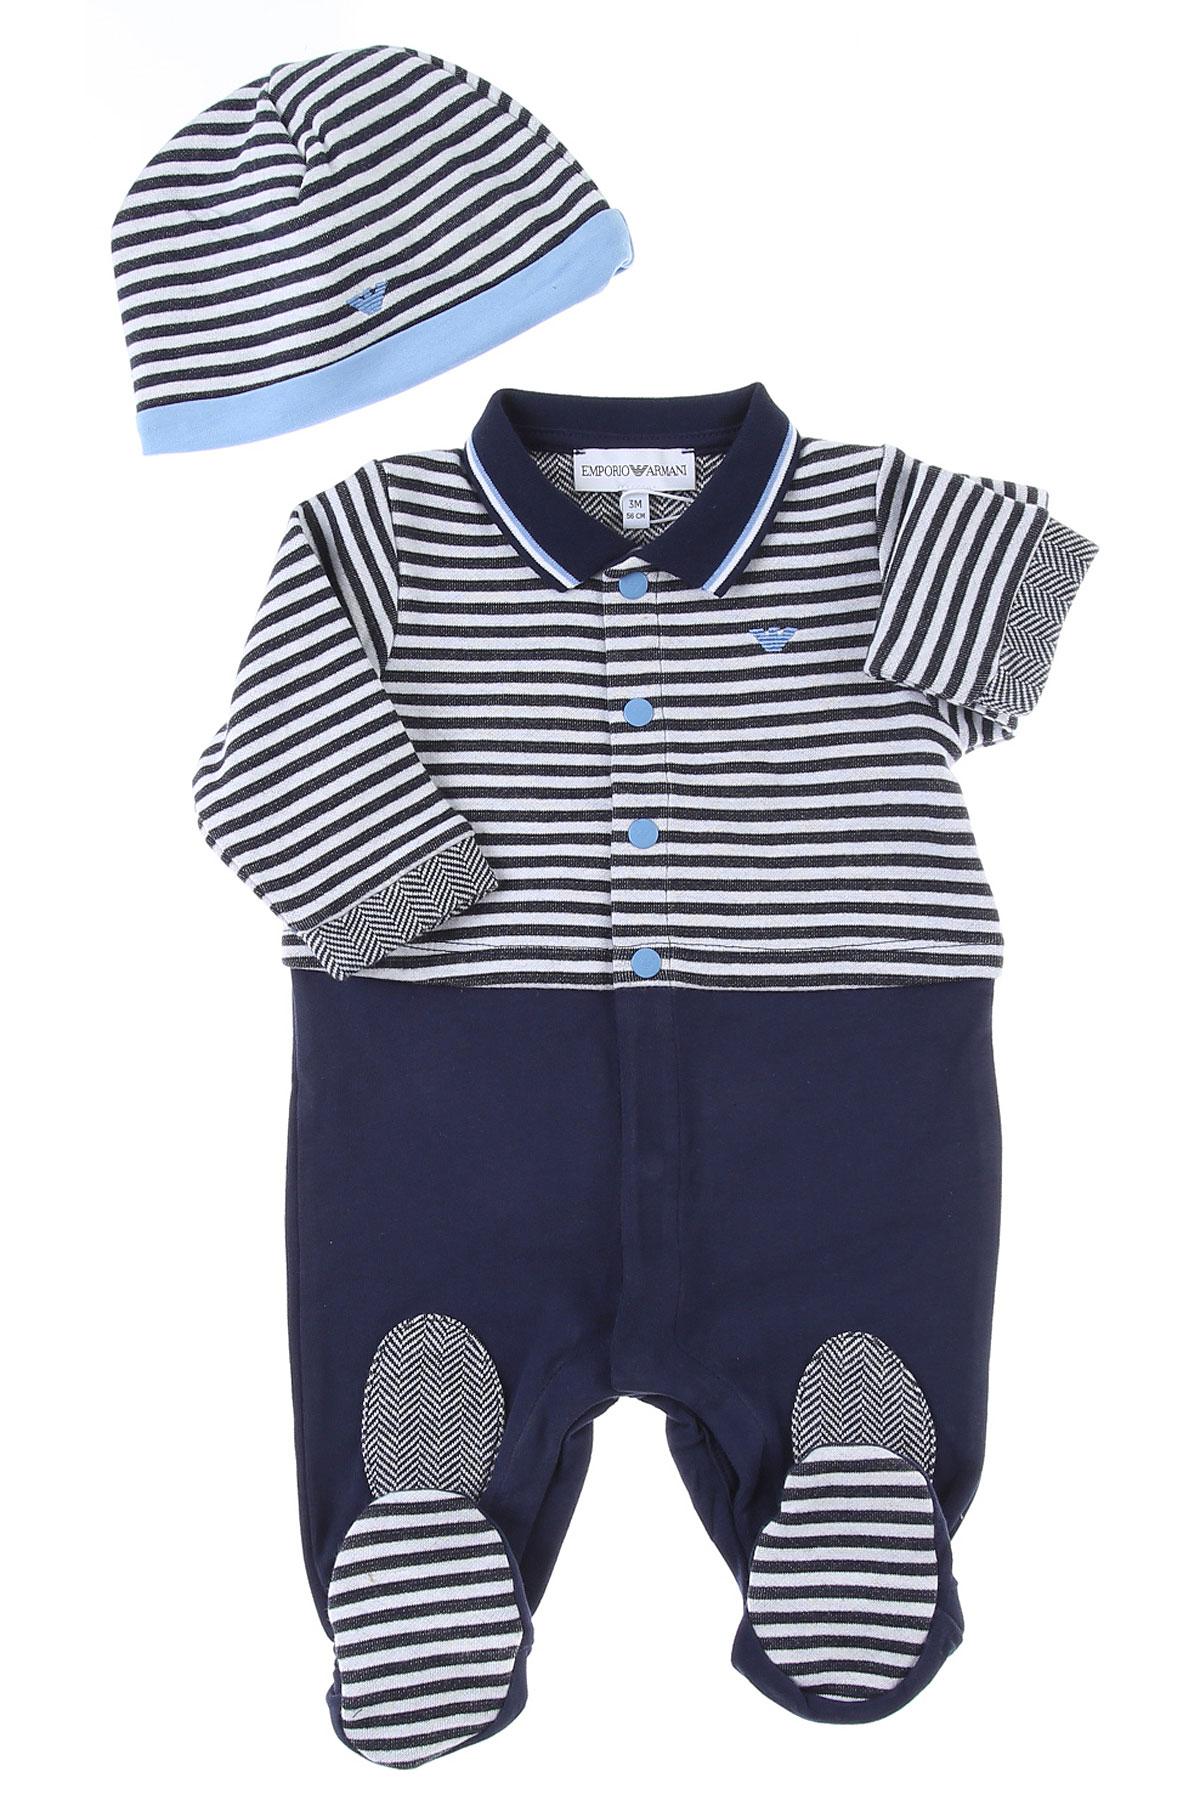 Emporio Armani Baby Bodysuits & Onesies for Boys On Sale, navy, Cotton, 2019, 1M 3M